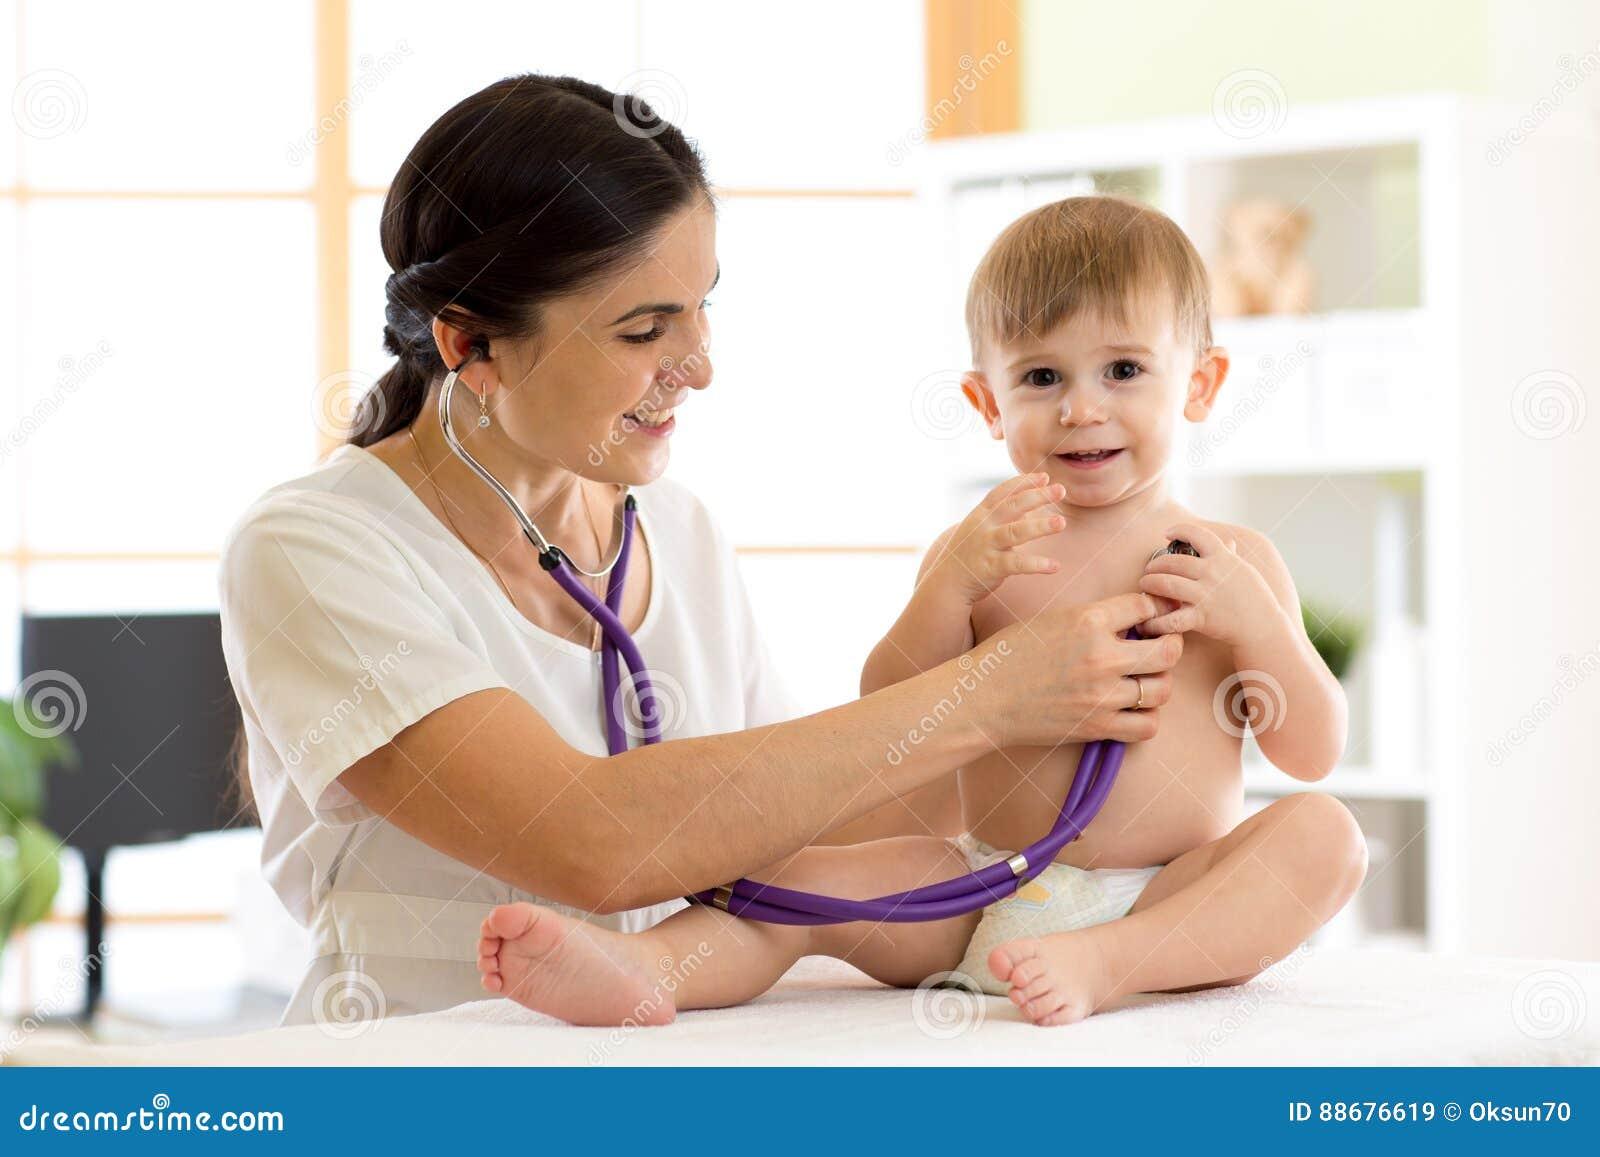 Female Doctor Examining Kid Little Child Stock Photo (Edit